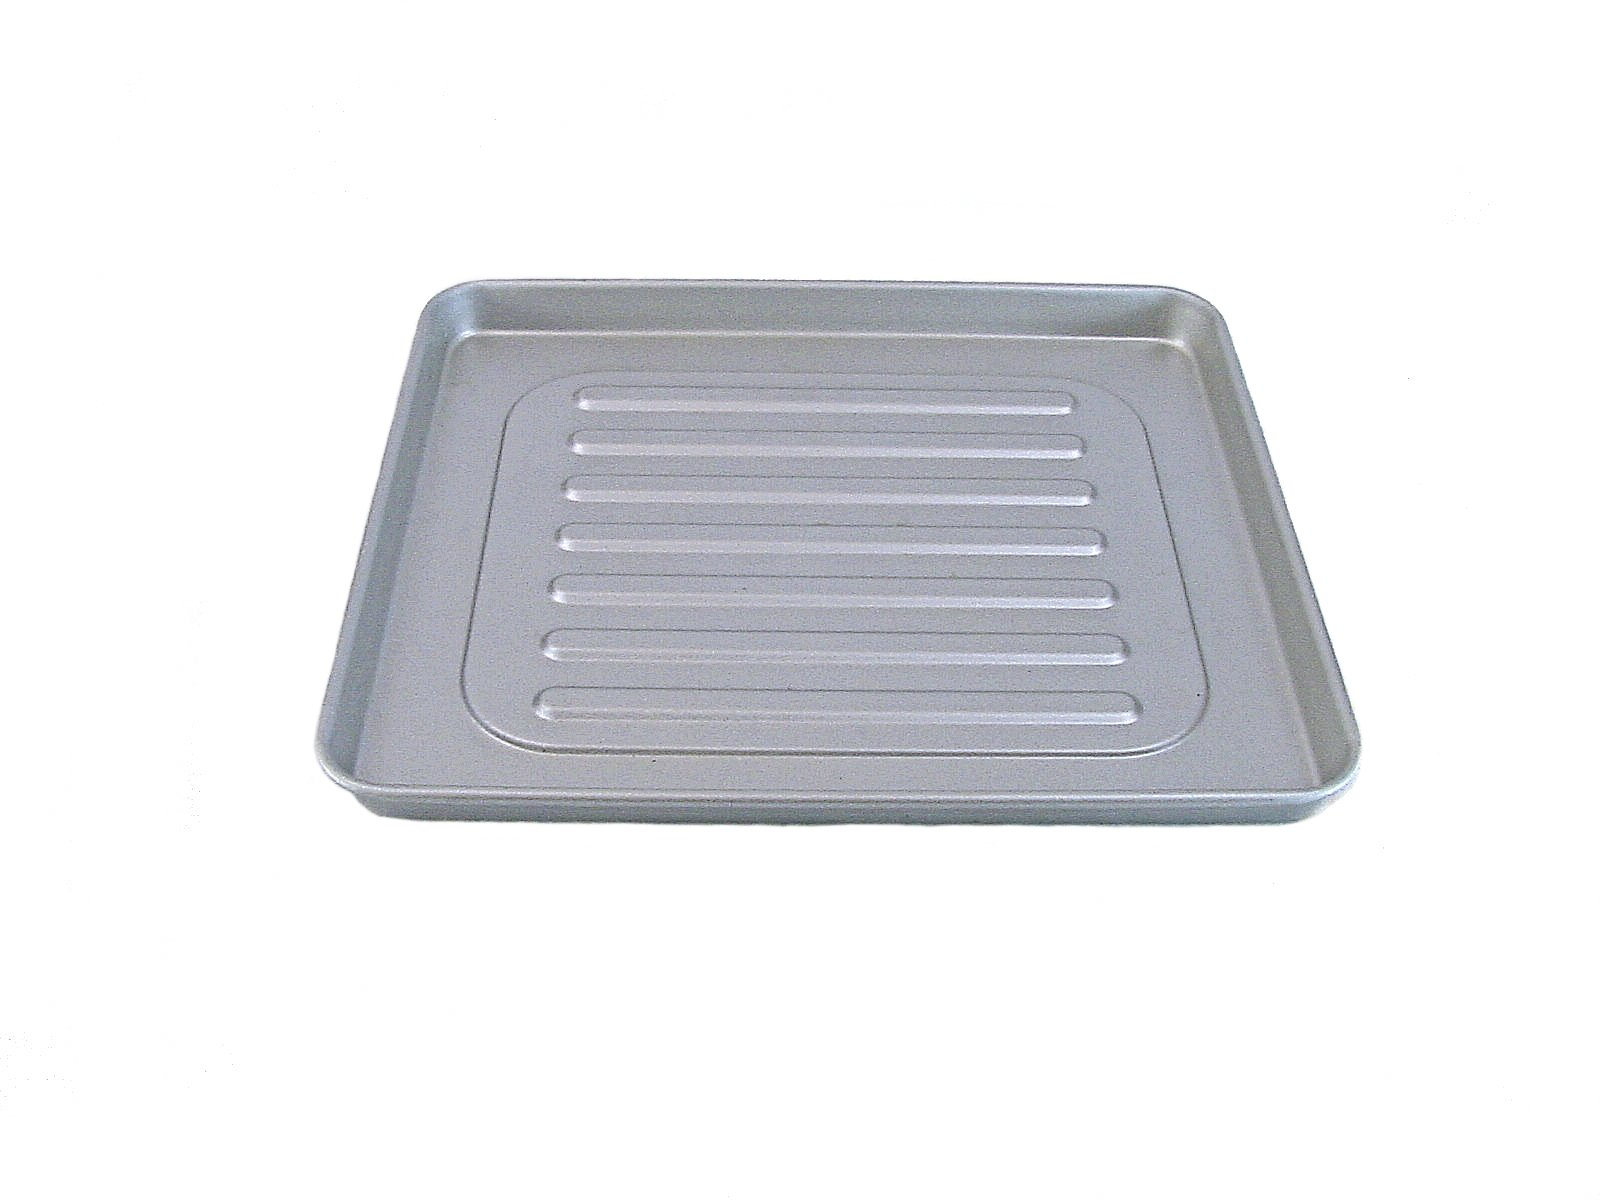 Broil/Bake Pan